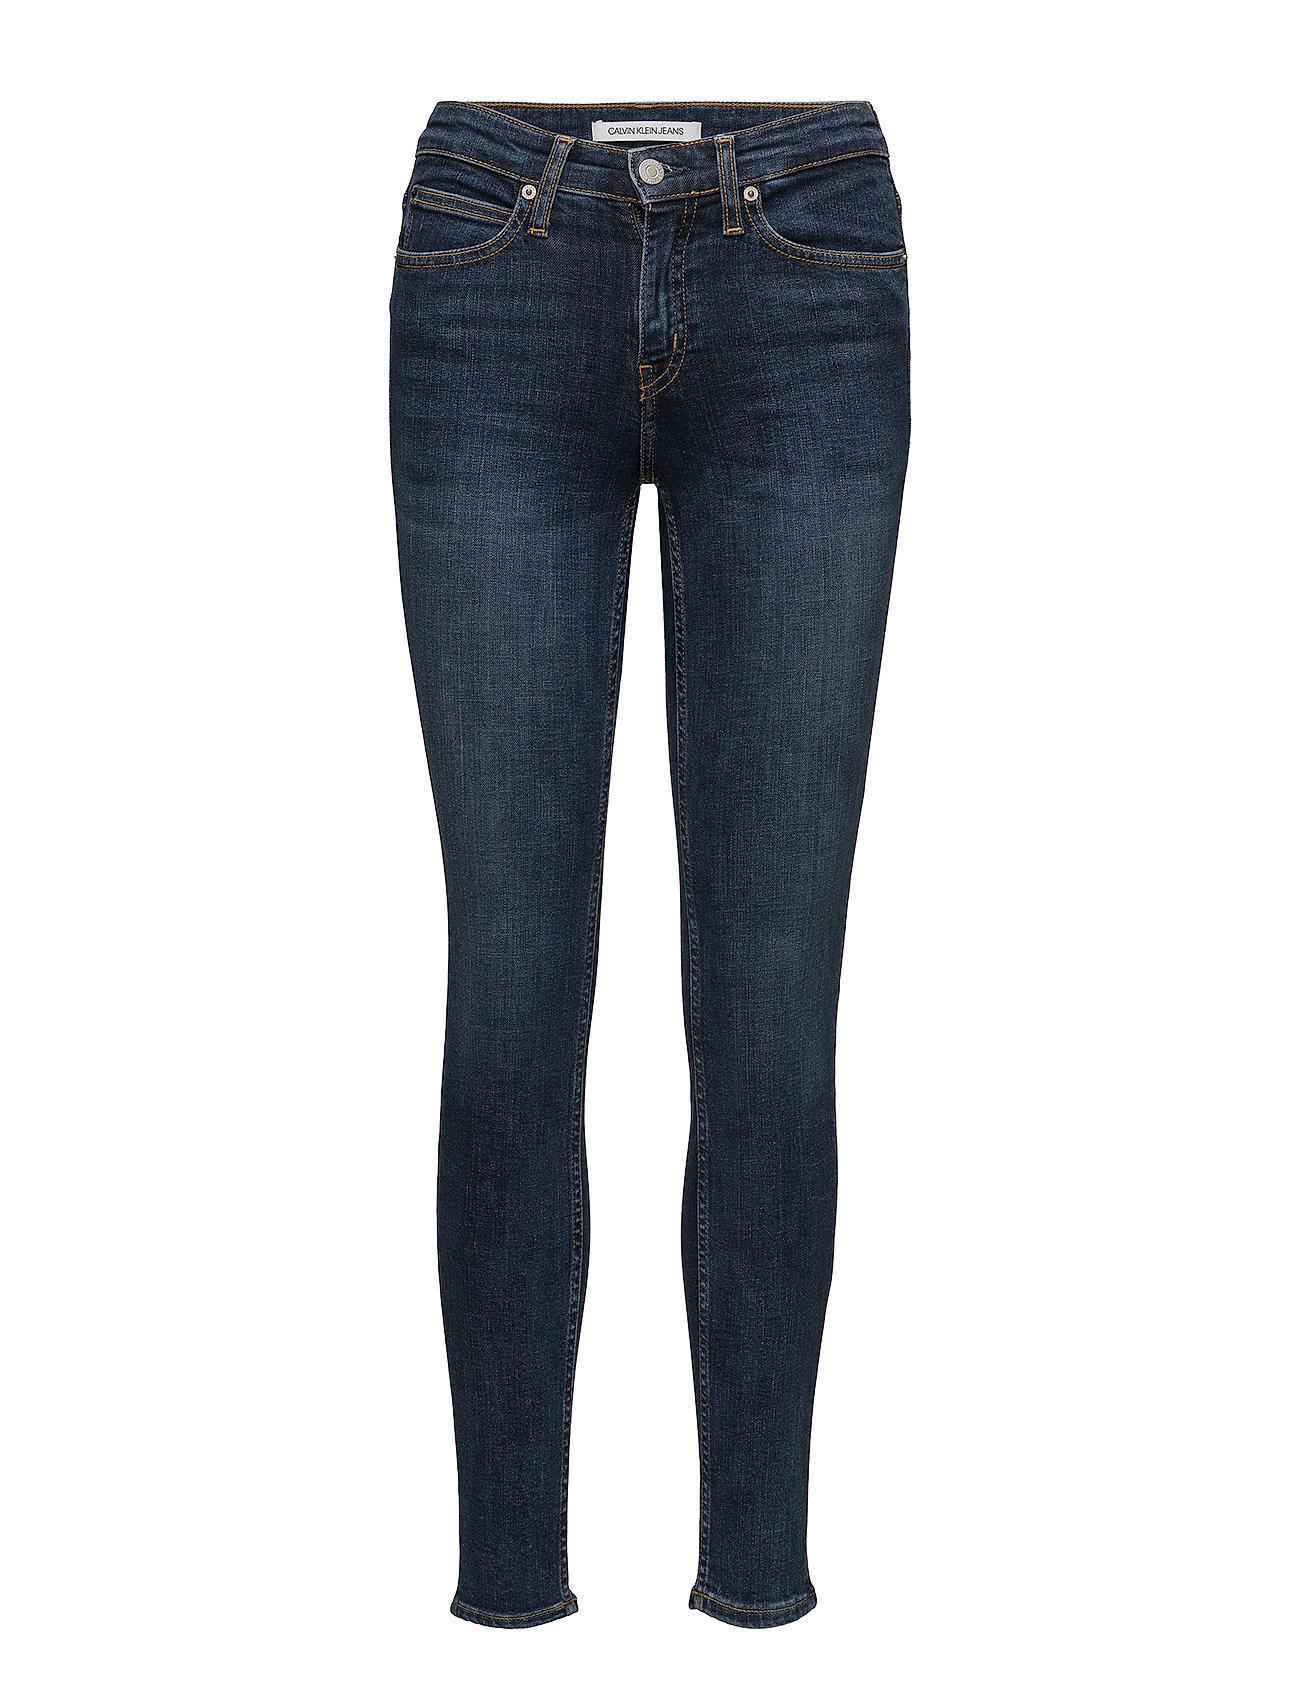 Calvin Klein Jeans CKJ 011 MID RISE SKI - AMSTERDAM BLUE MID